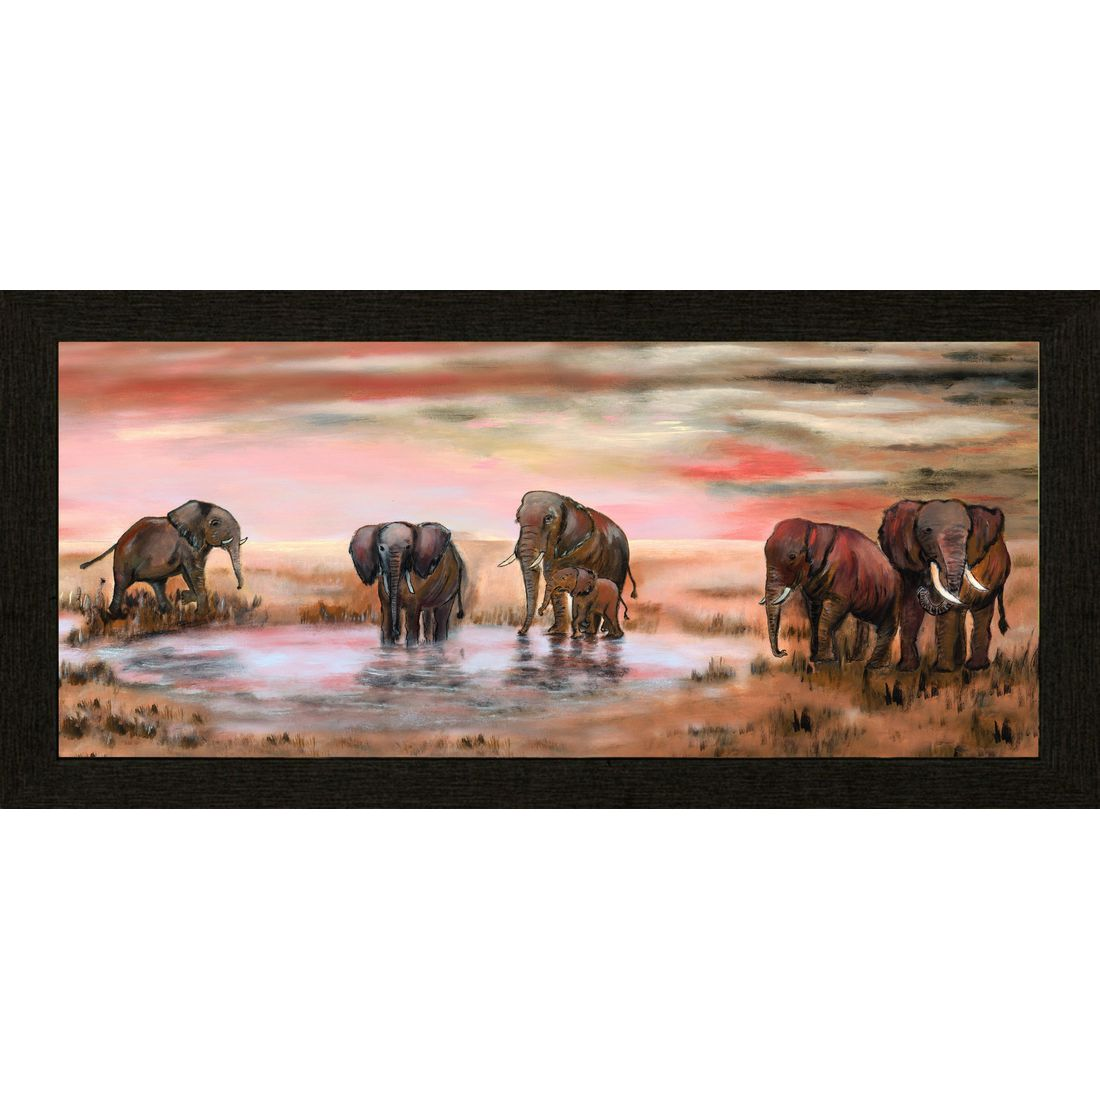 Gerahmtes Poster Elephant Family – Braun, Rosa, Bönninghoff online bestellen